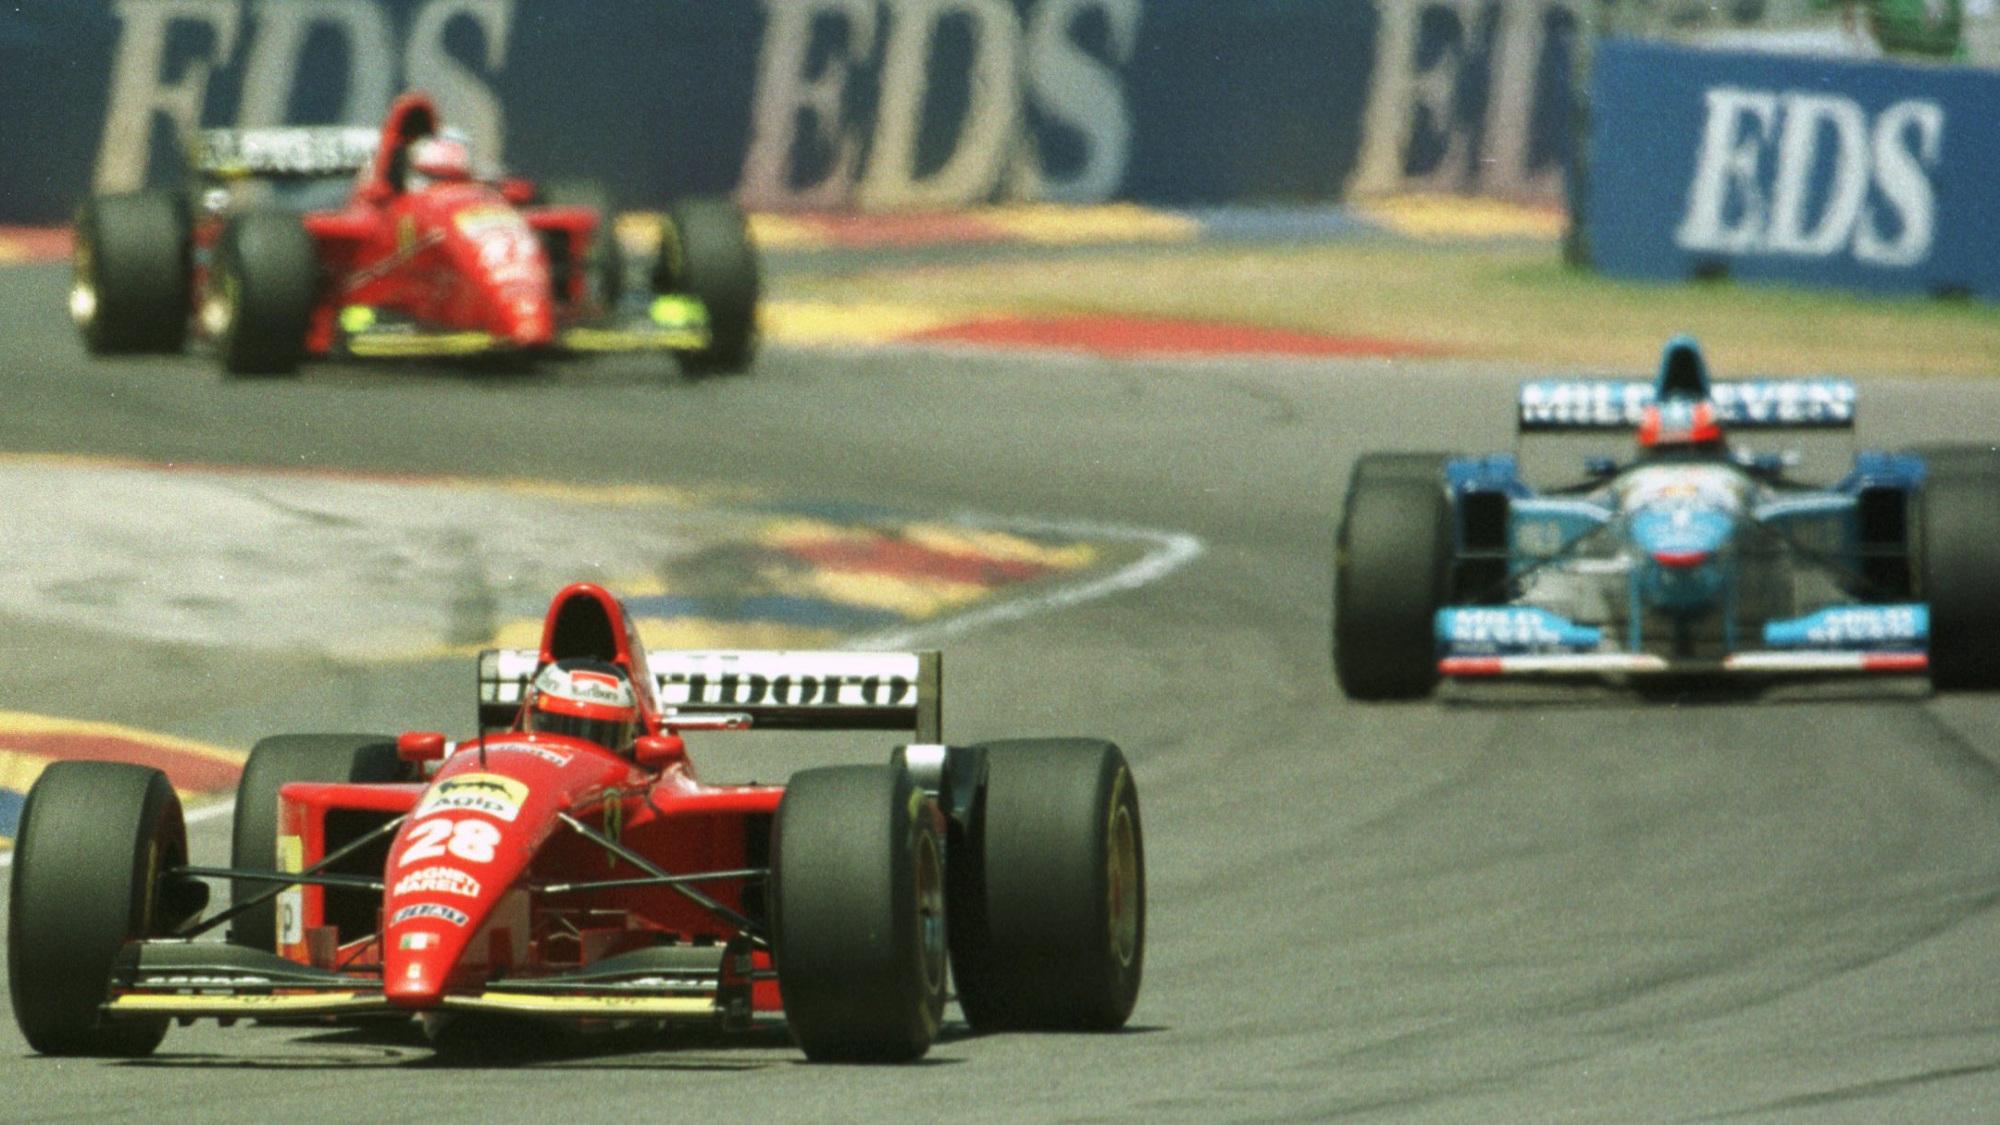 Jean Alesi, Gerhard Berger, 1995 Australian GP